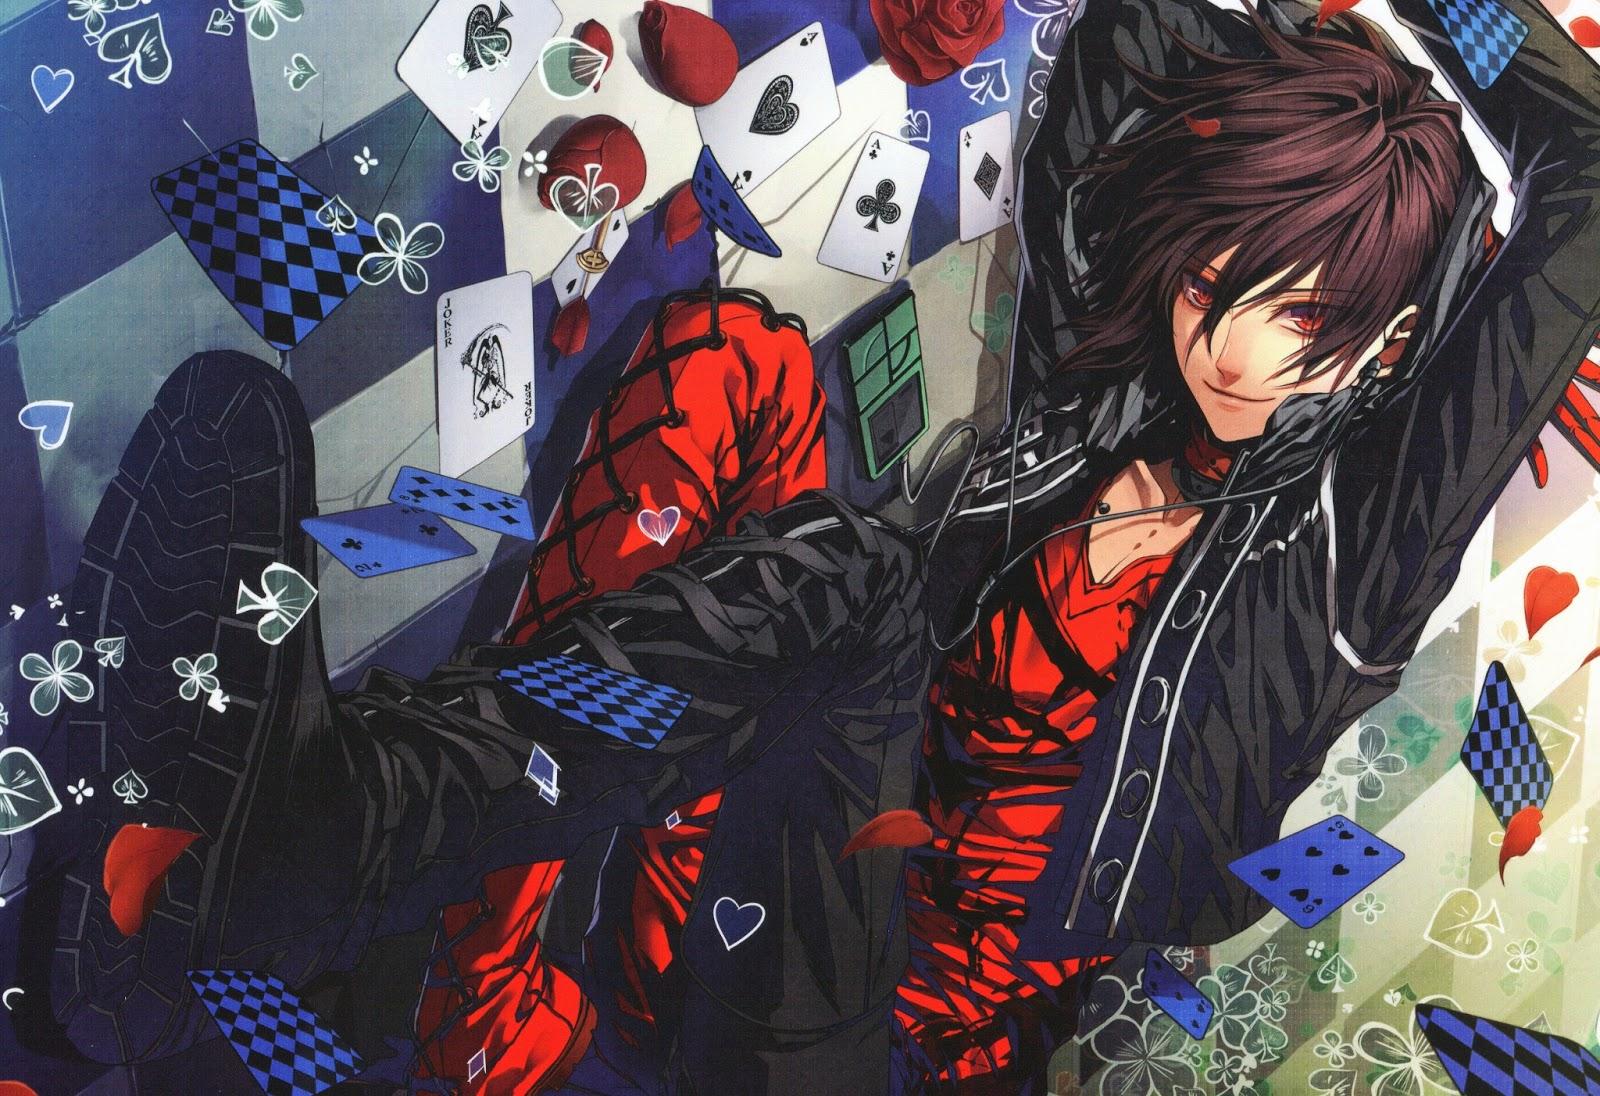 Clothing Style of Anime